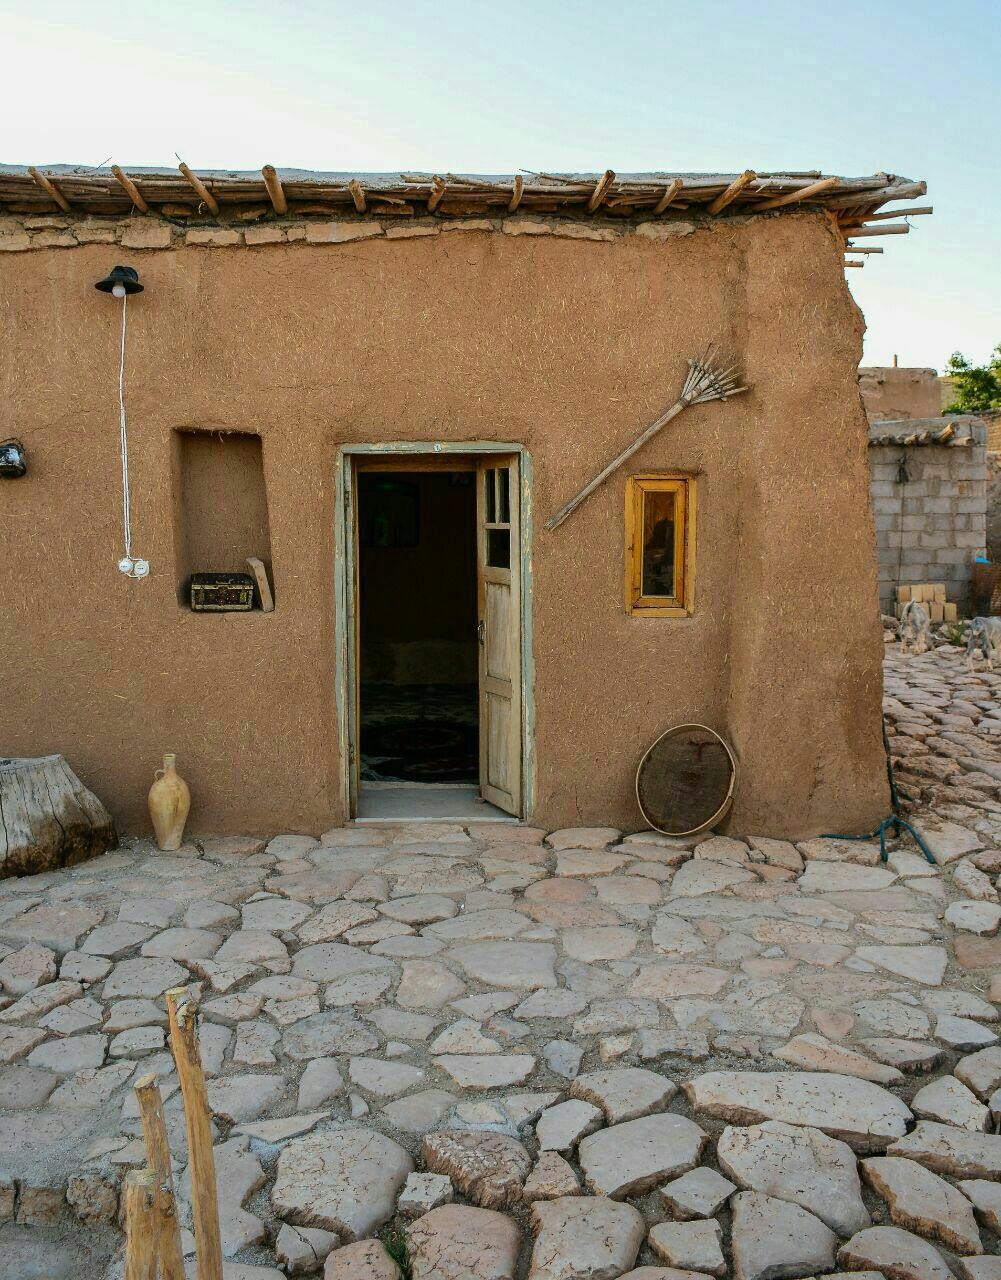 Eco-tourism اتاق سنتی در قصر یعقوب خرم بید - اتاق 1